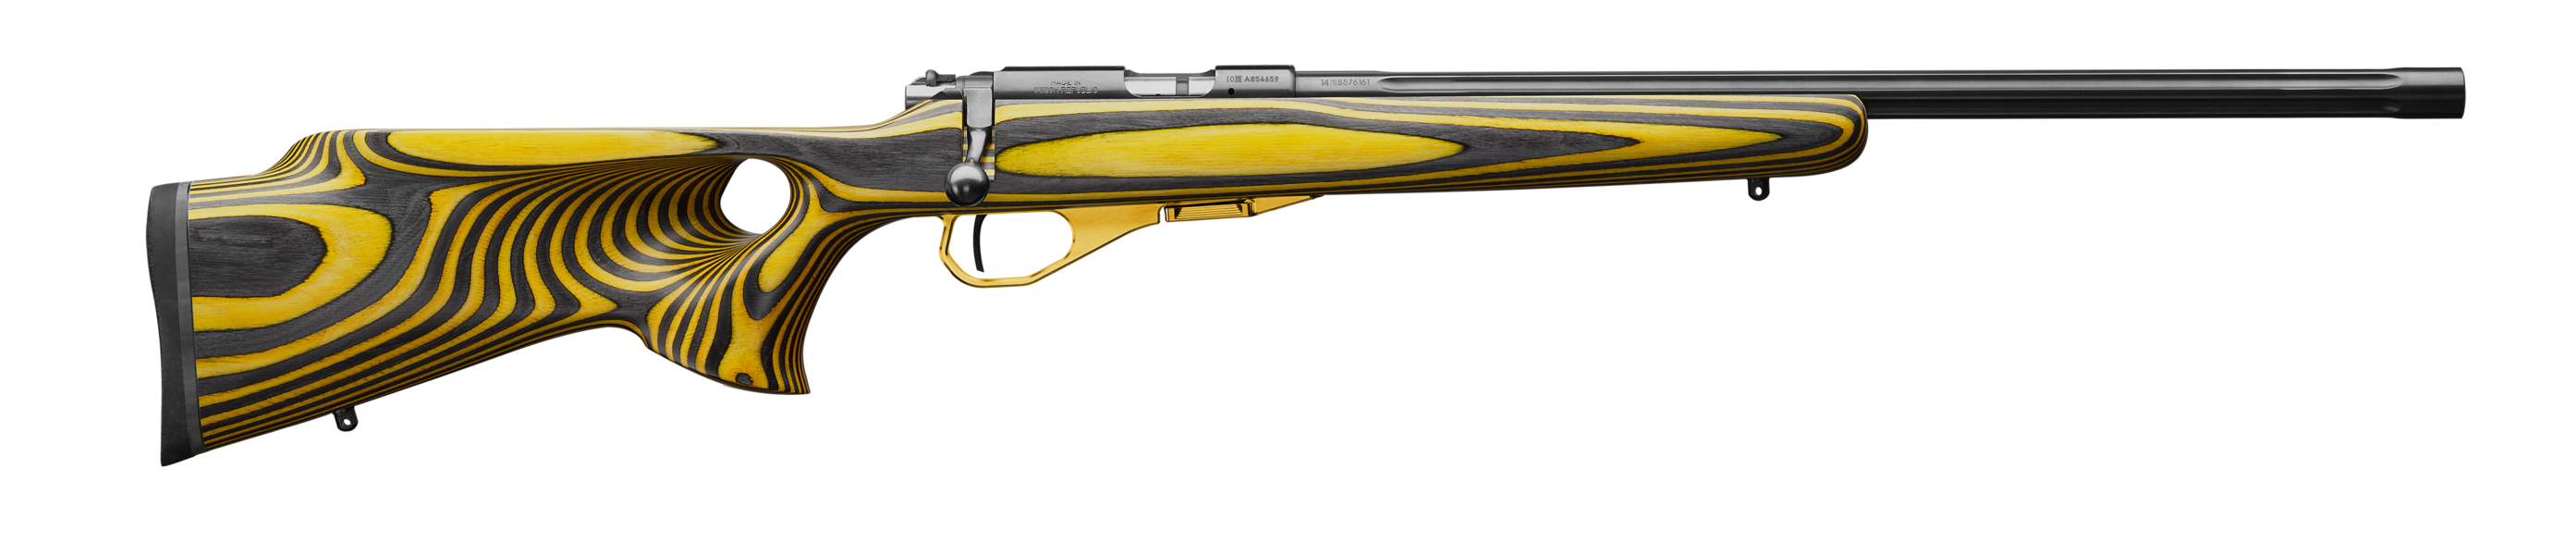 Cz 455 thumbhole yellow right